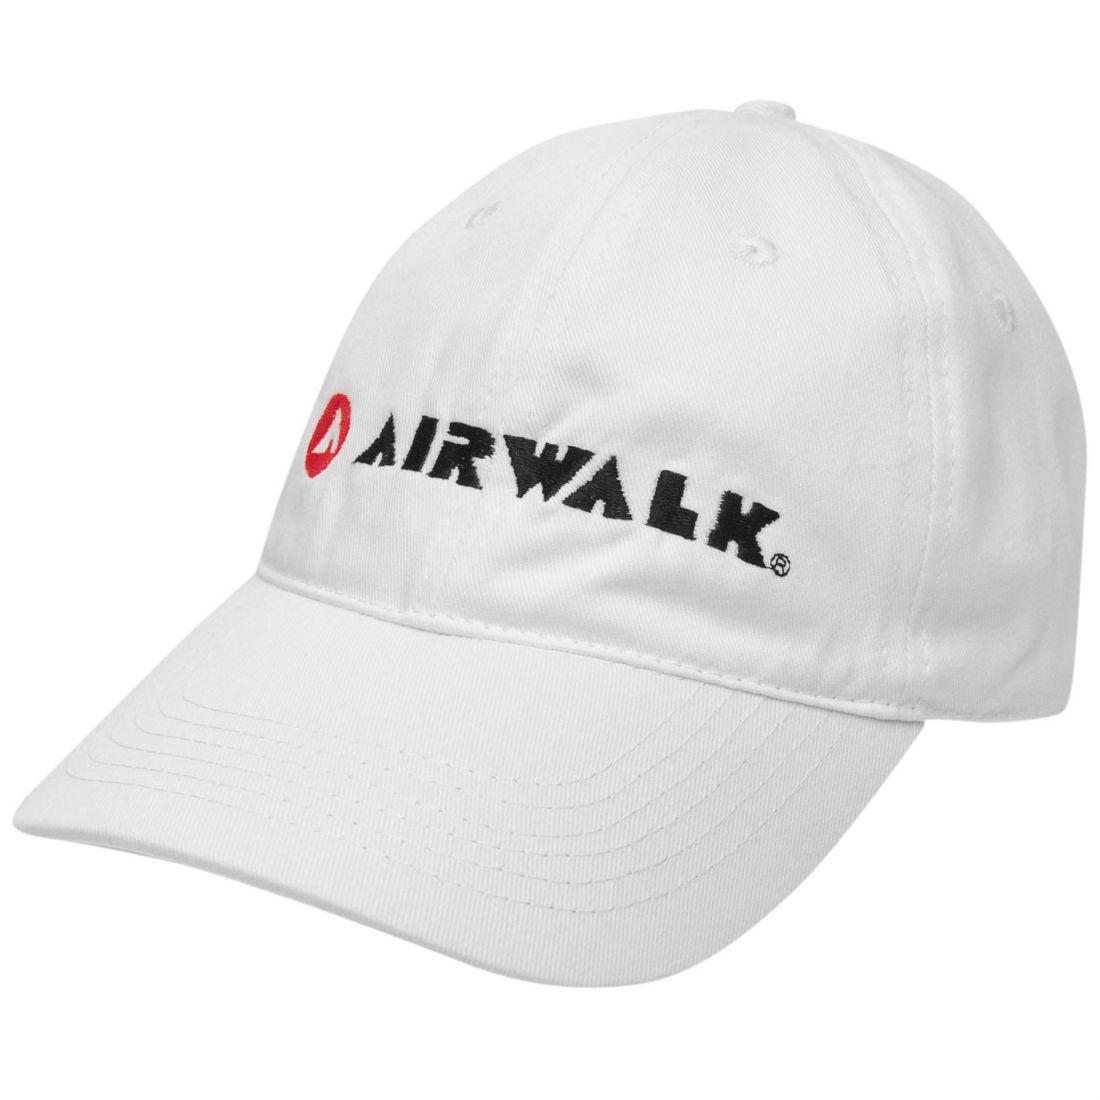 Airwalk Mens Baseball Cap Cotton Breathability Ventilation  0c004226eceb